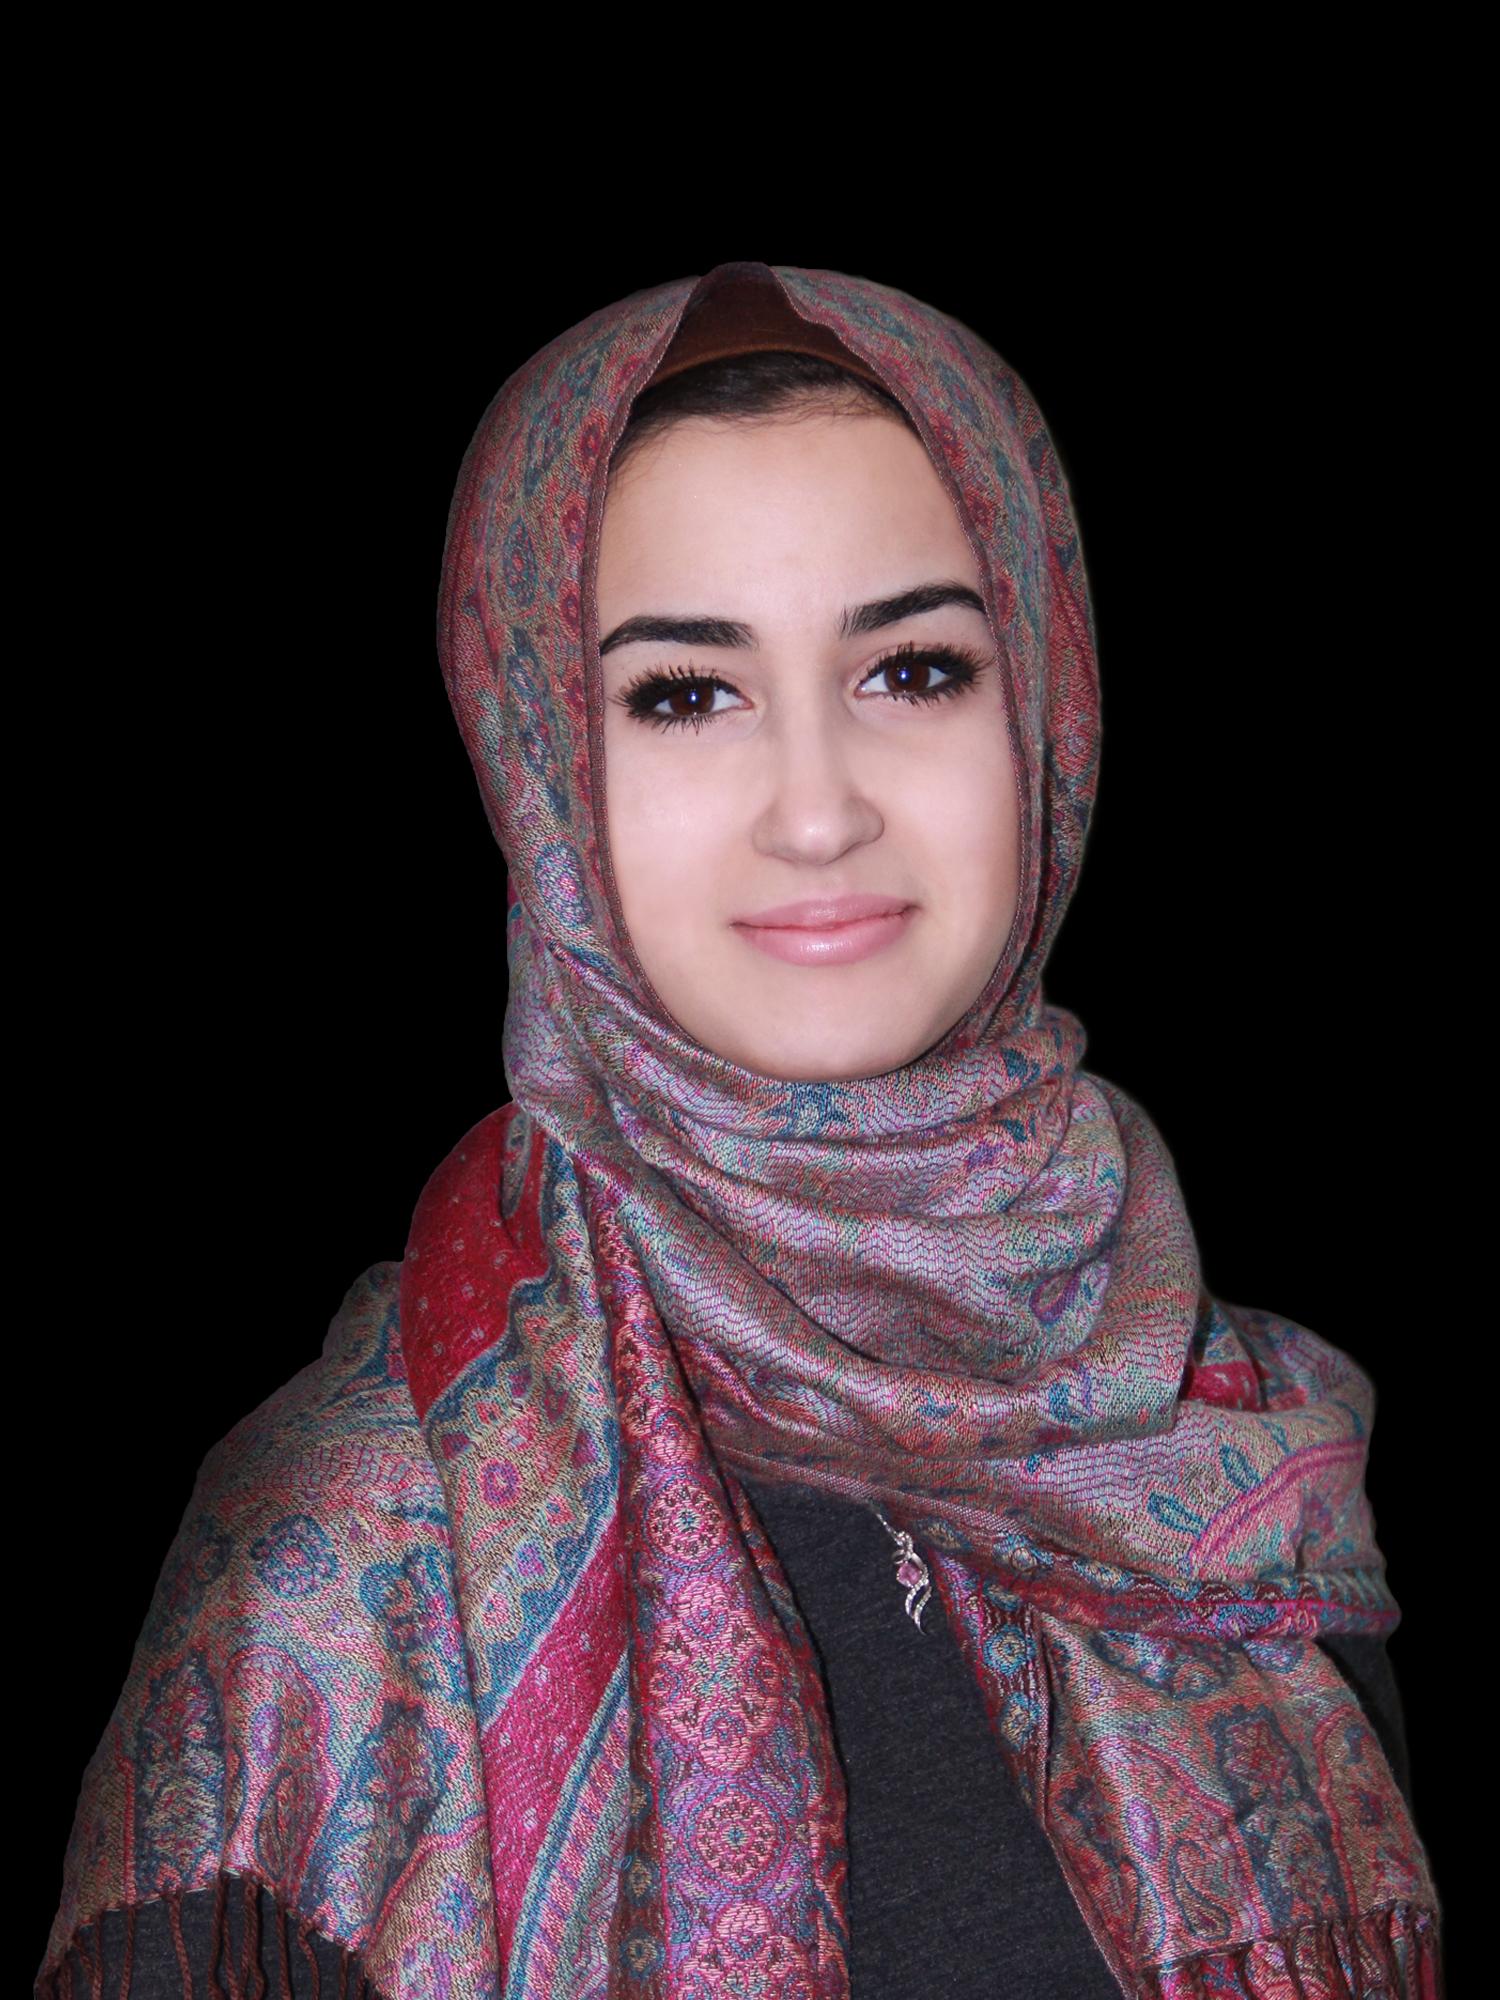 Safiya Aboaed